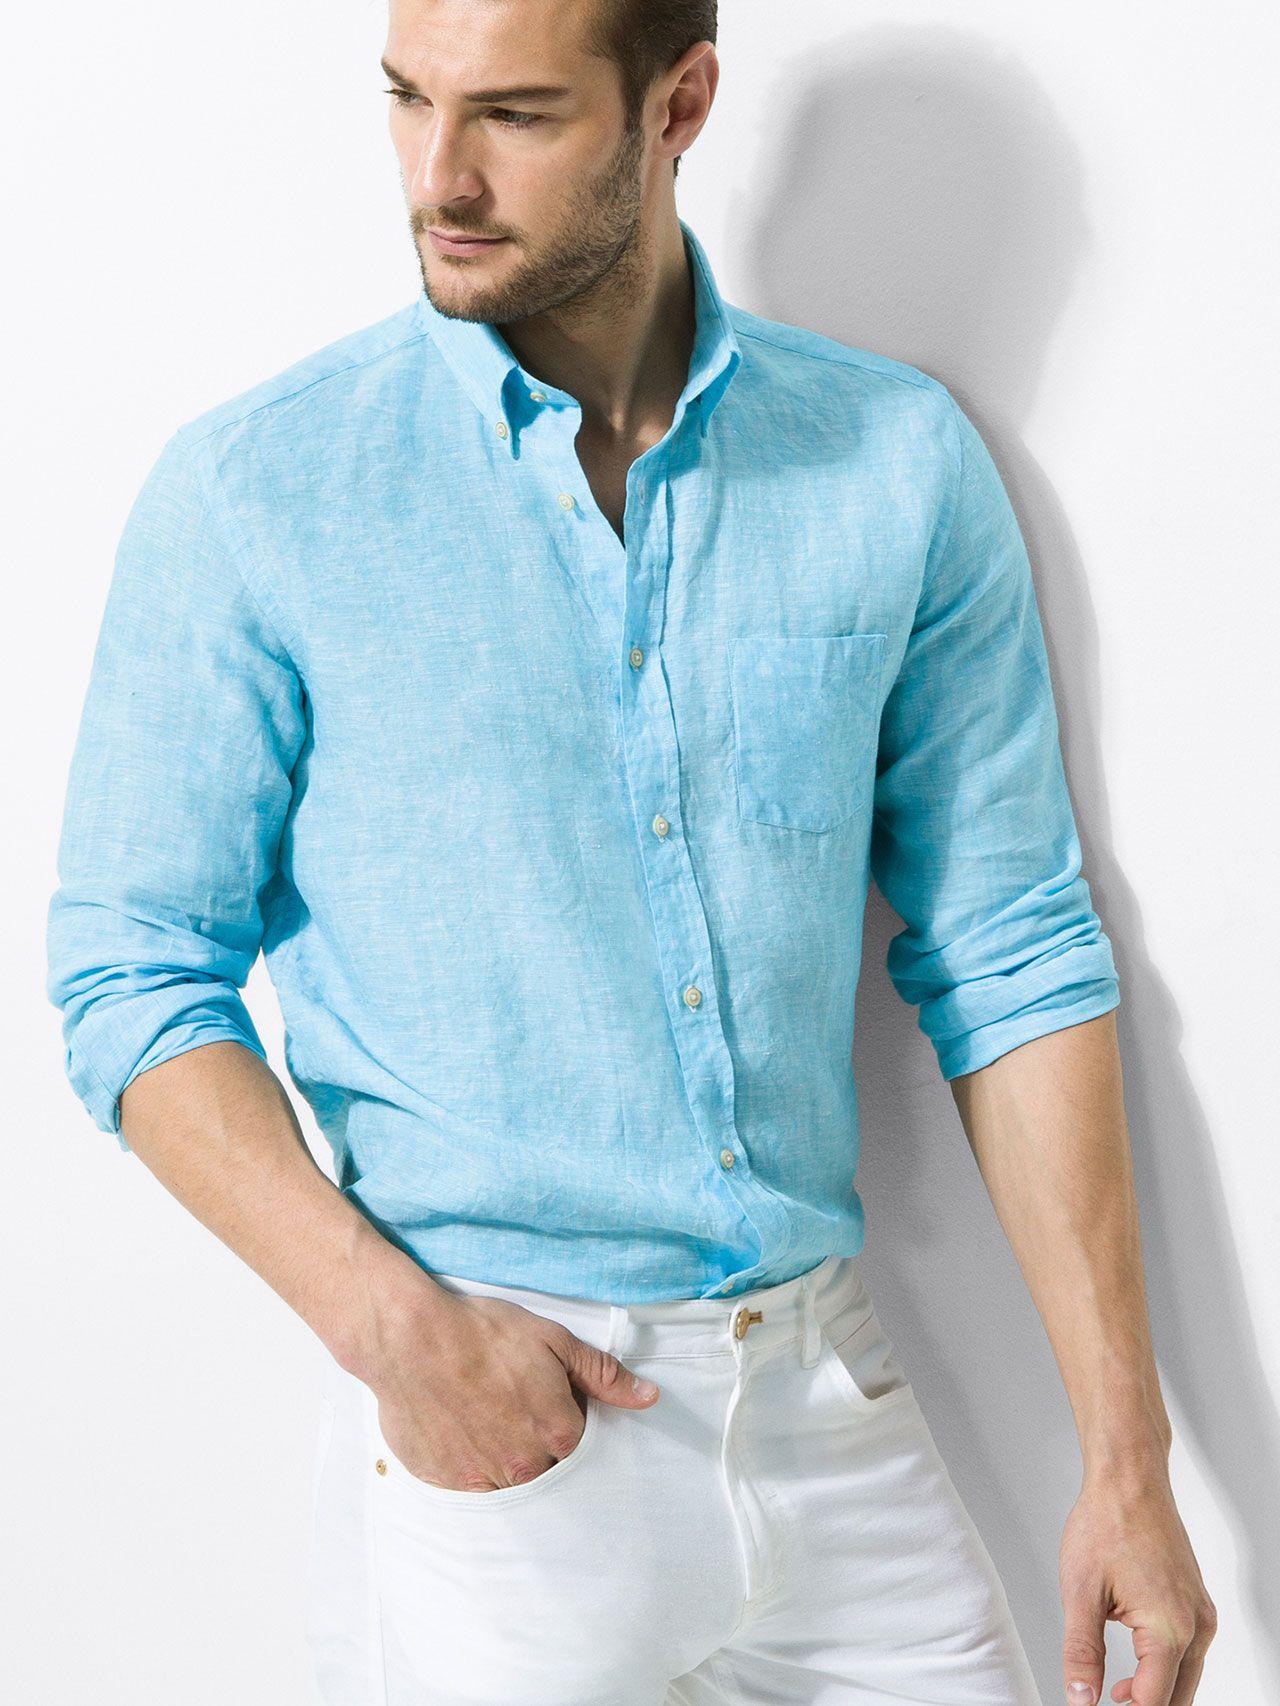 LIGHT TURQUOISE LINEN SHIRT | colors | Pinterest | Light turquoise